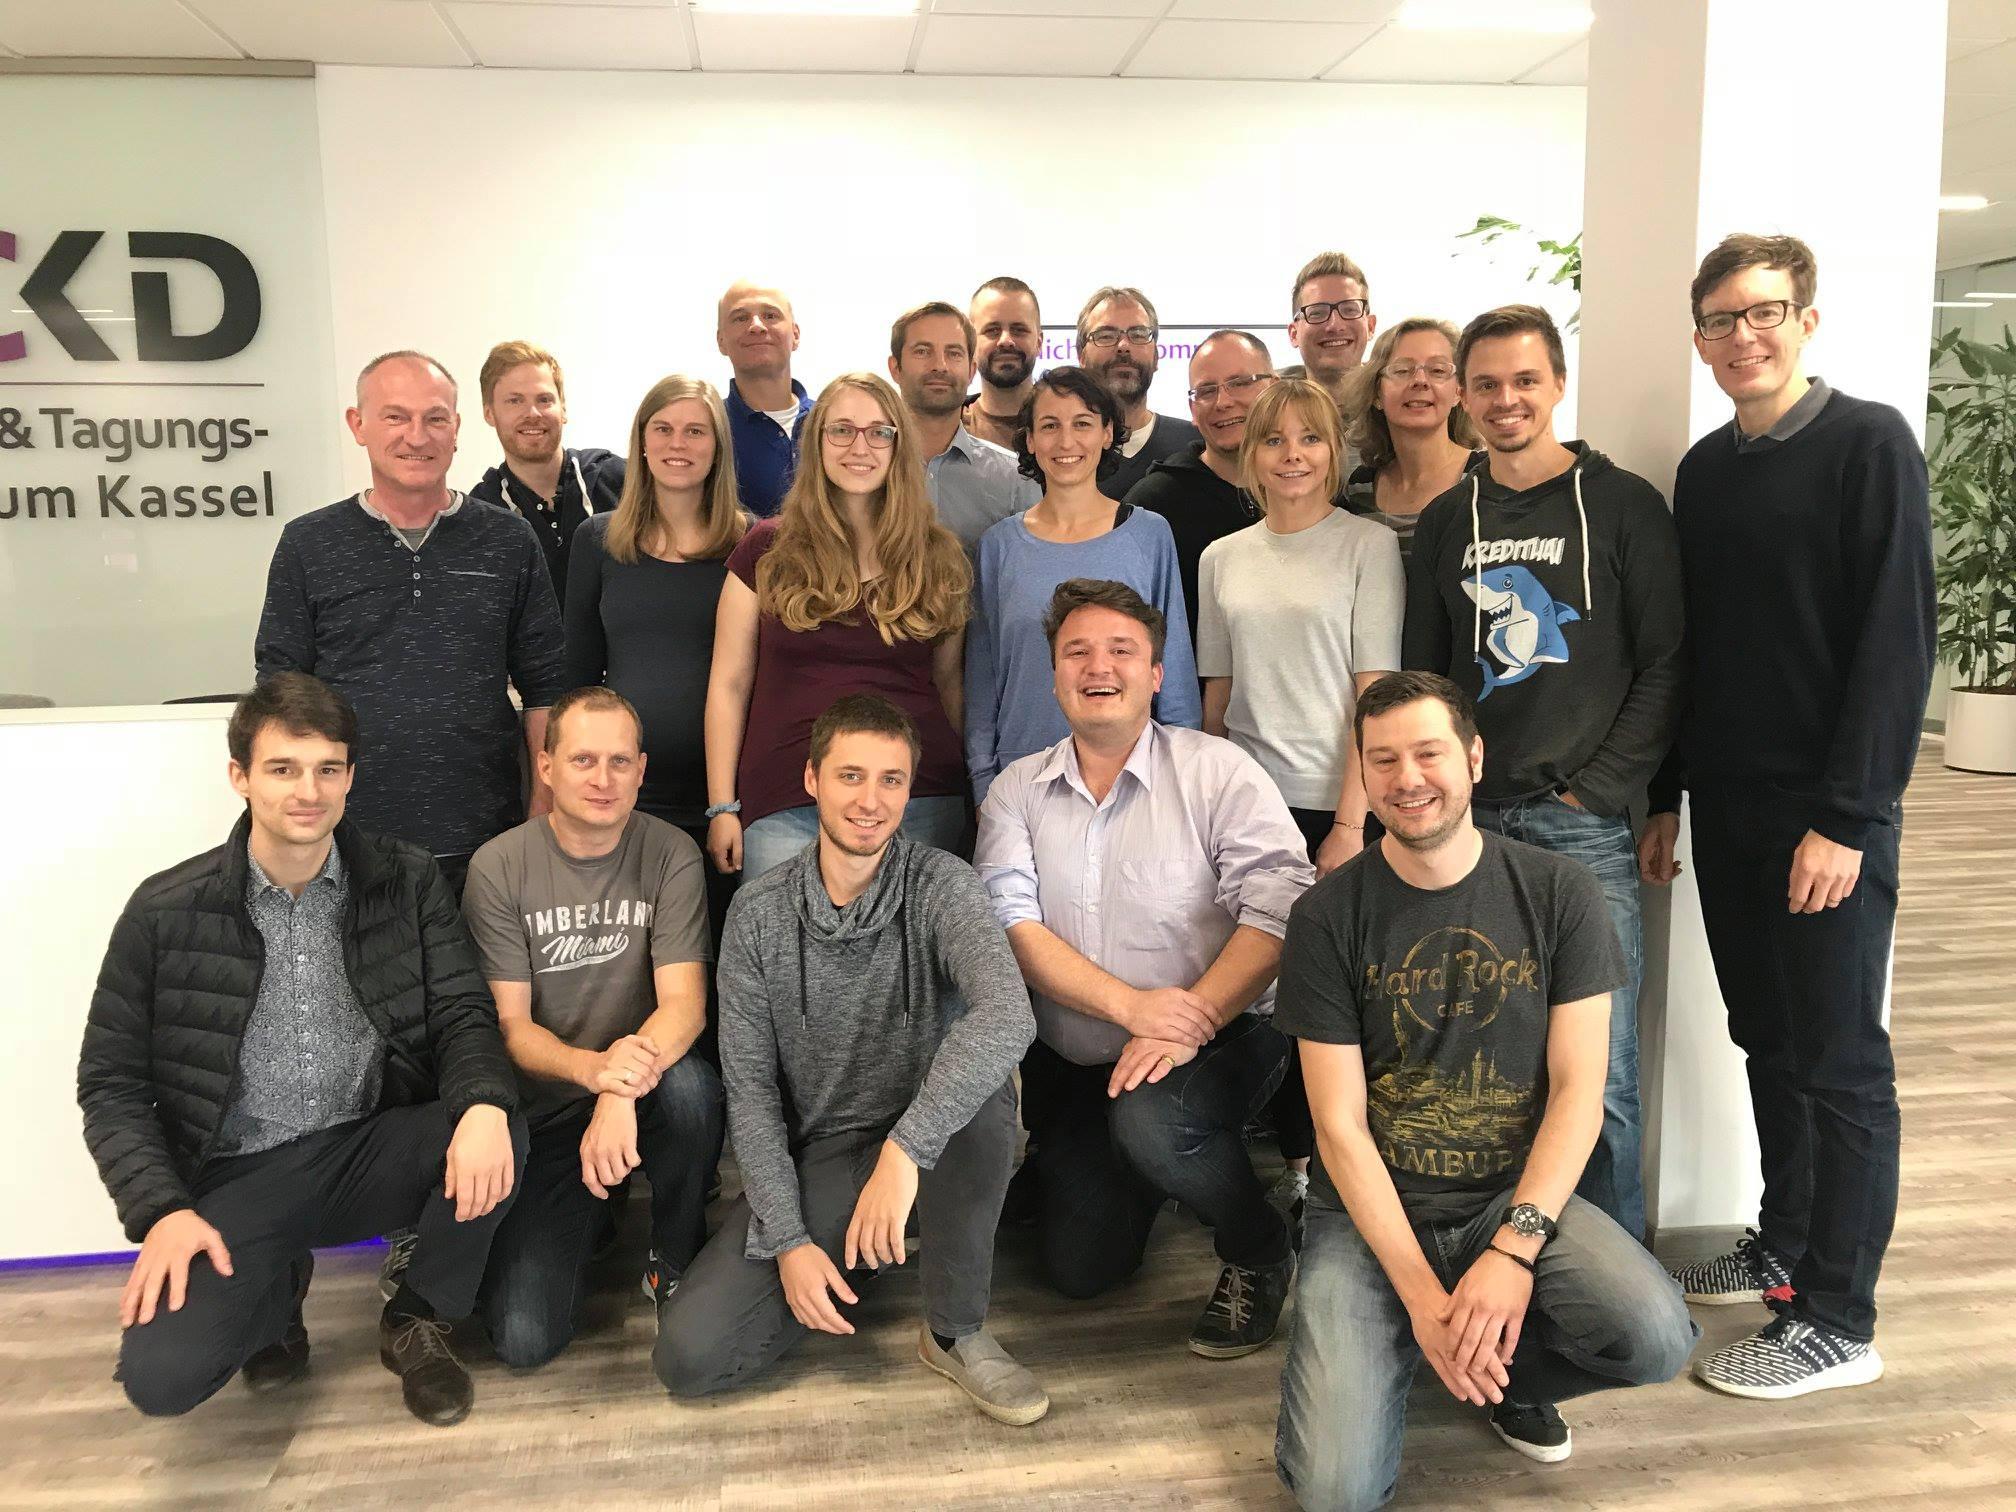 Gruppenfoto Finanzbloggerkonferenz 2018 in Kassel